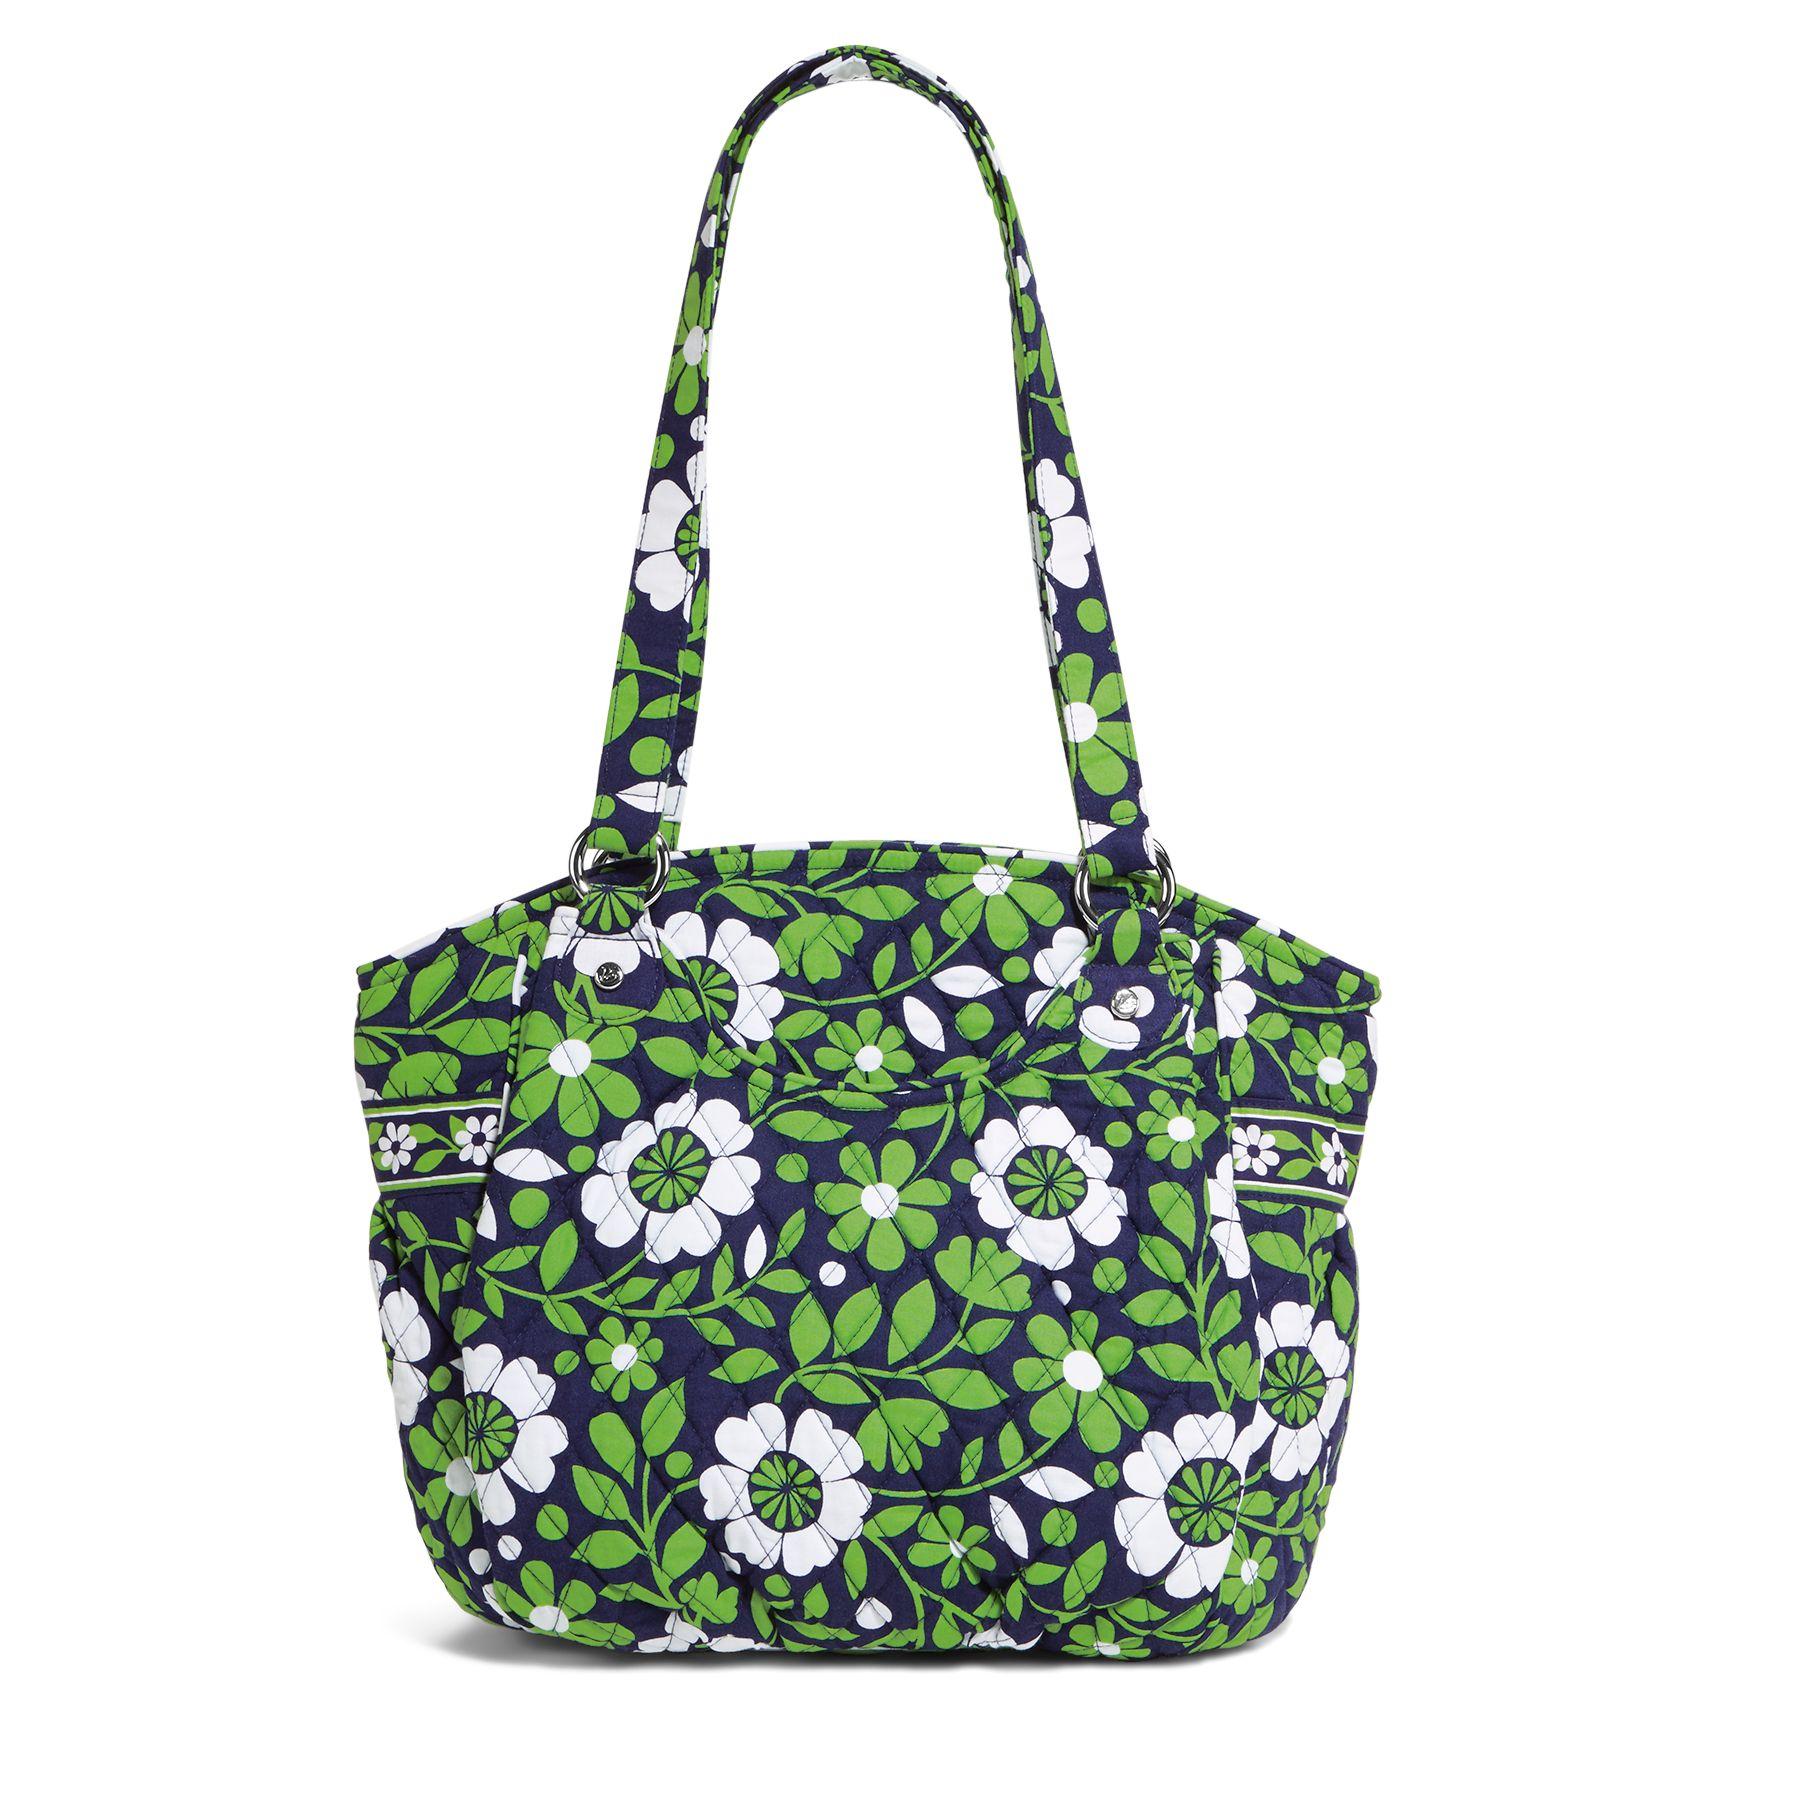 Vera Bradley Glenna Shoulder Bag in Lucky You